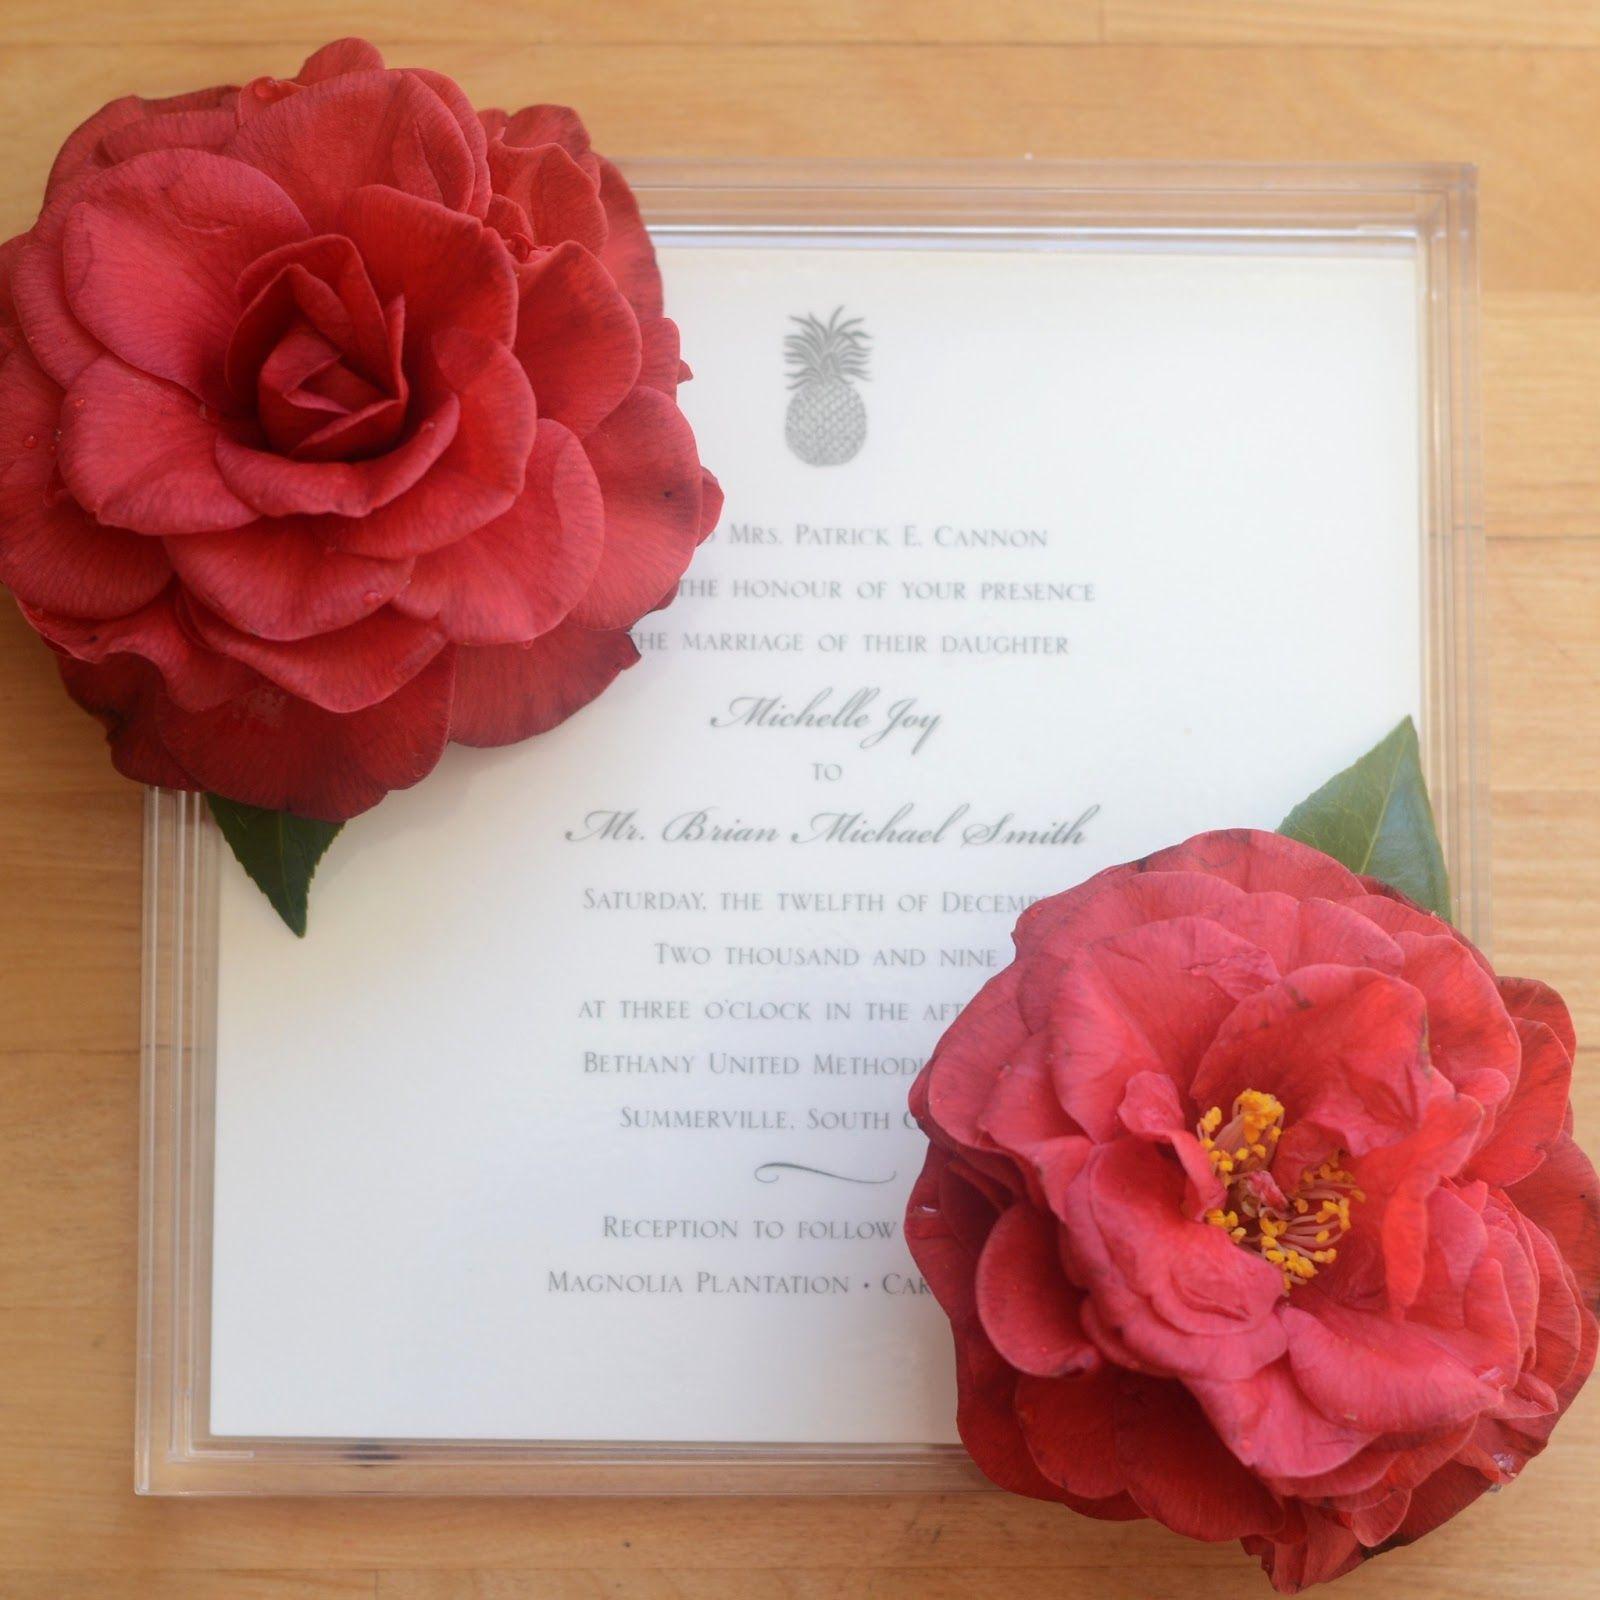 IRON + TWINE}: Upcycled Wedding Invitation ~ Lucite Tray | Funky ...